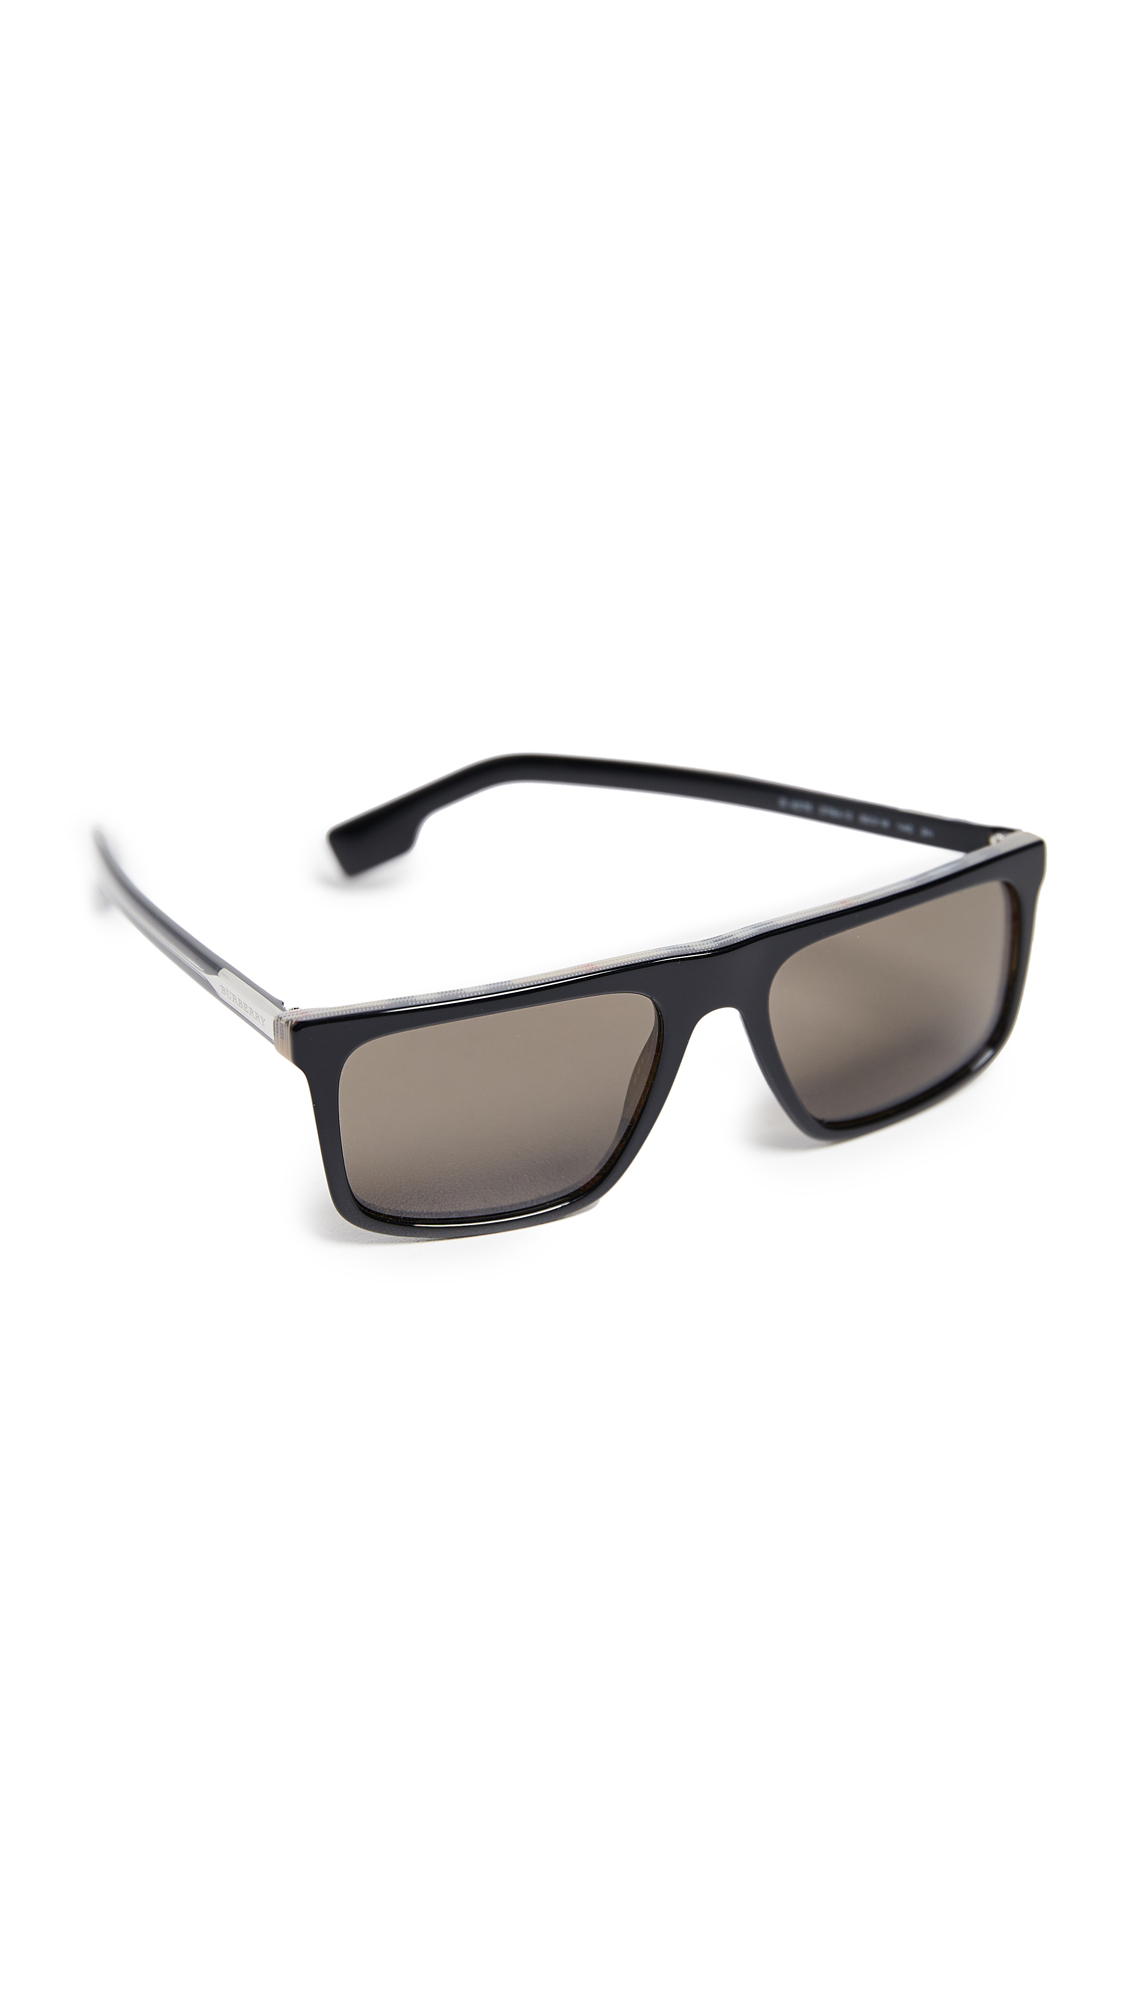 efdb615e617f Burberry Flat Top Sunglasses In Black/Brown   ModeSens